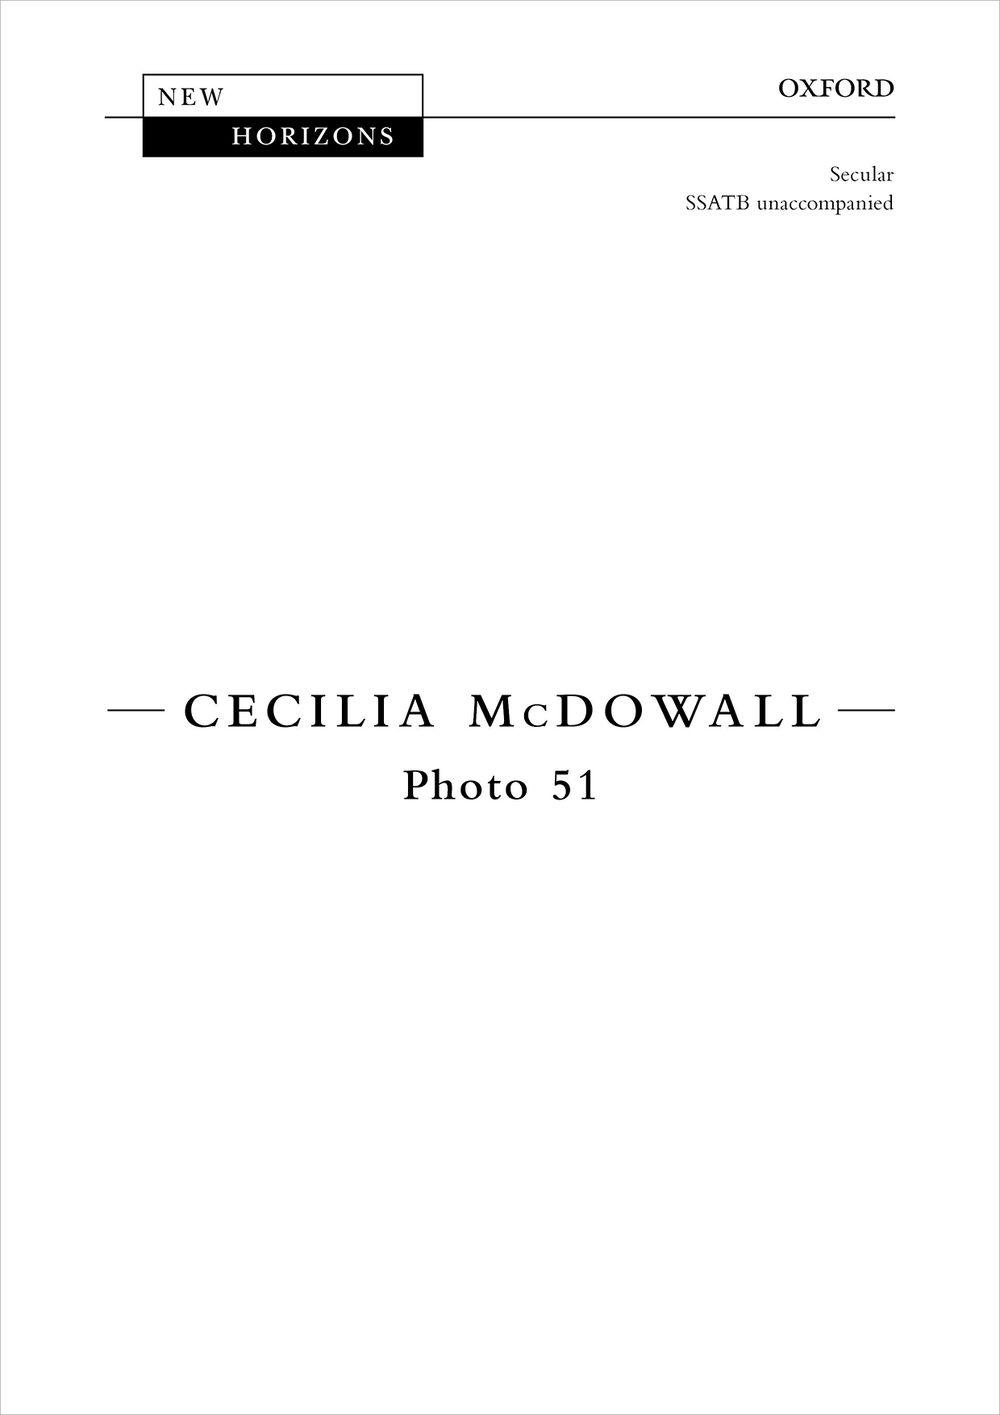 Photo 51: Mixed Choir A Cappella: Vocal Score